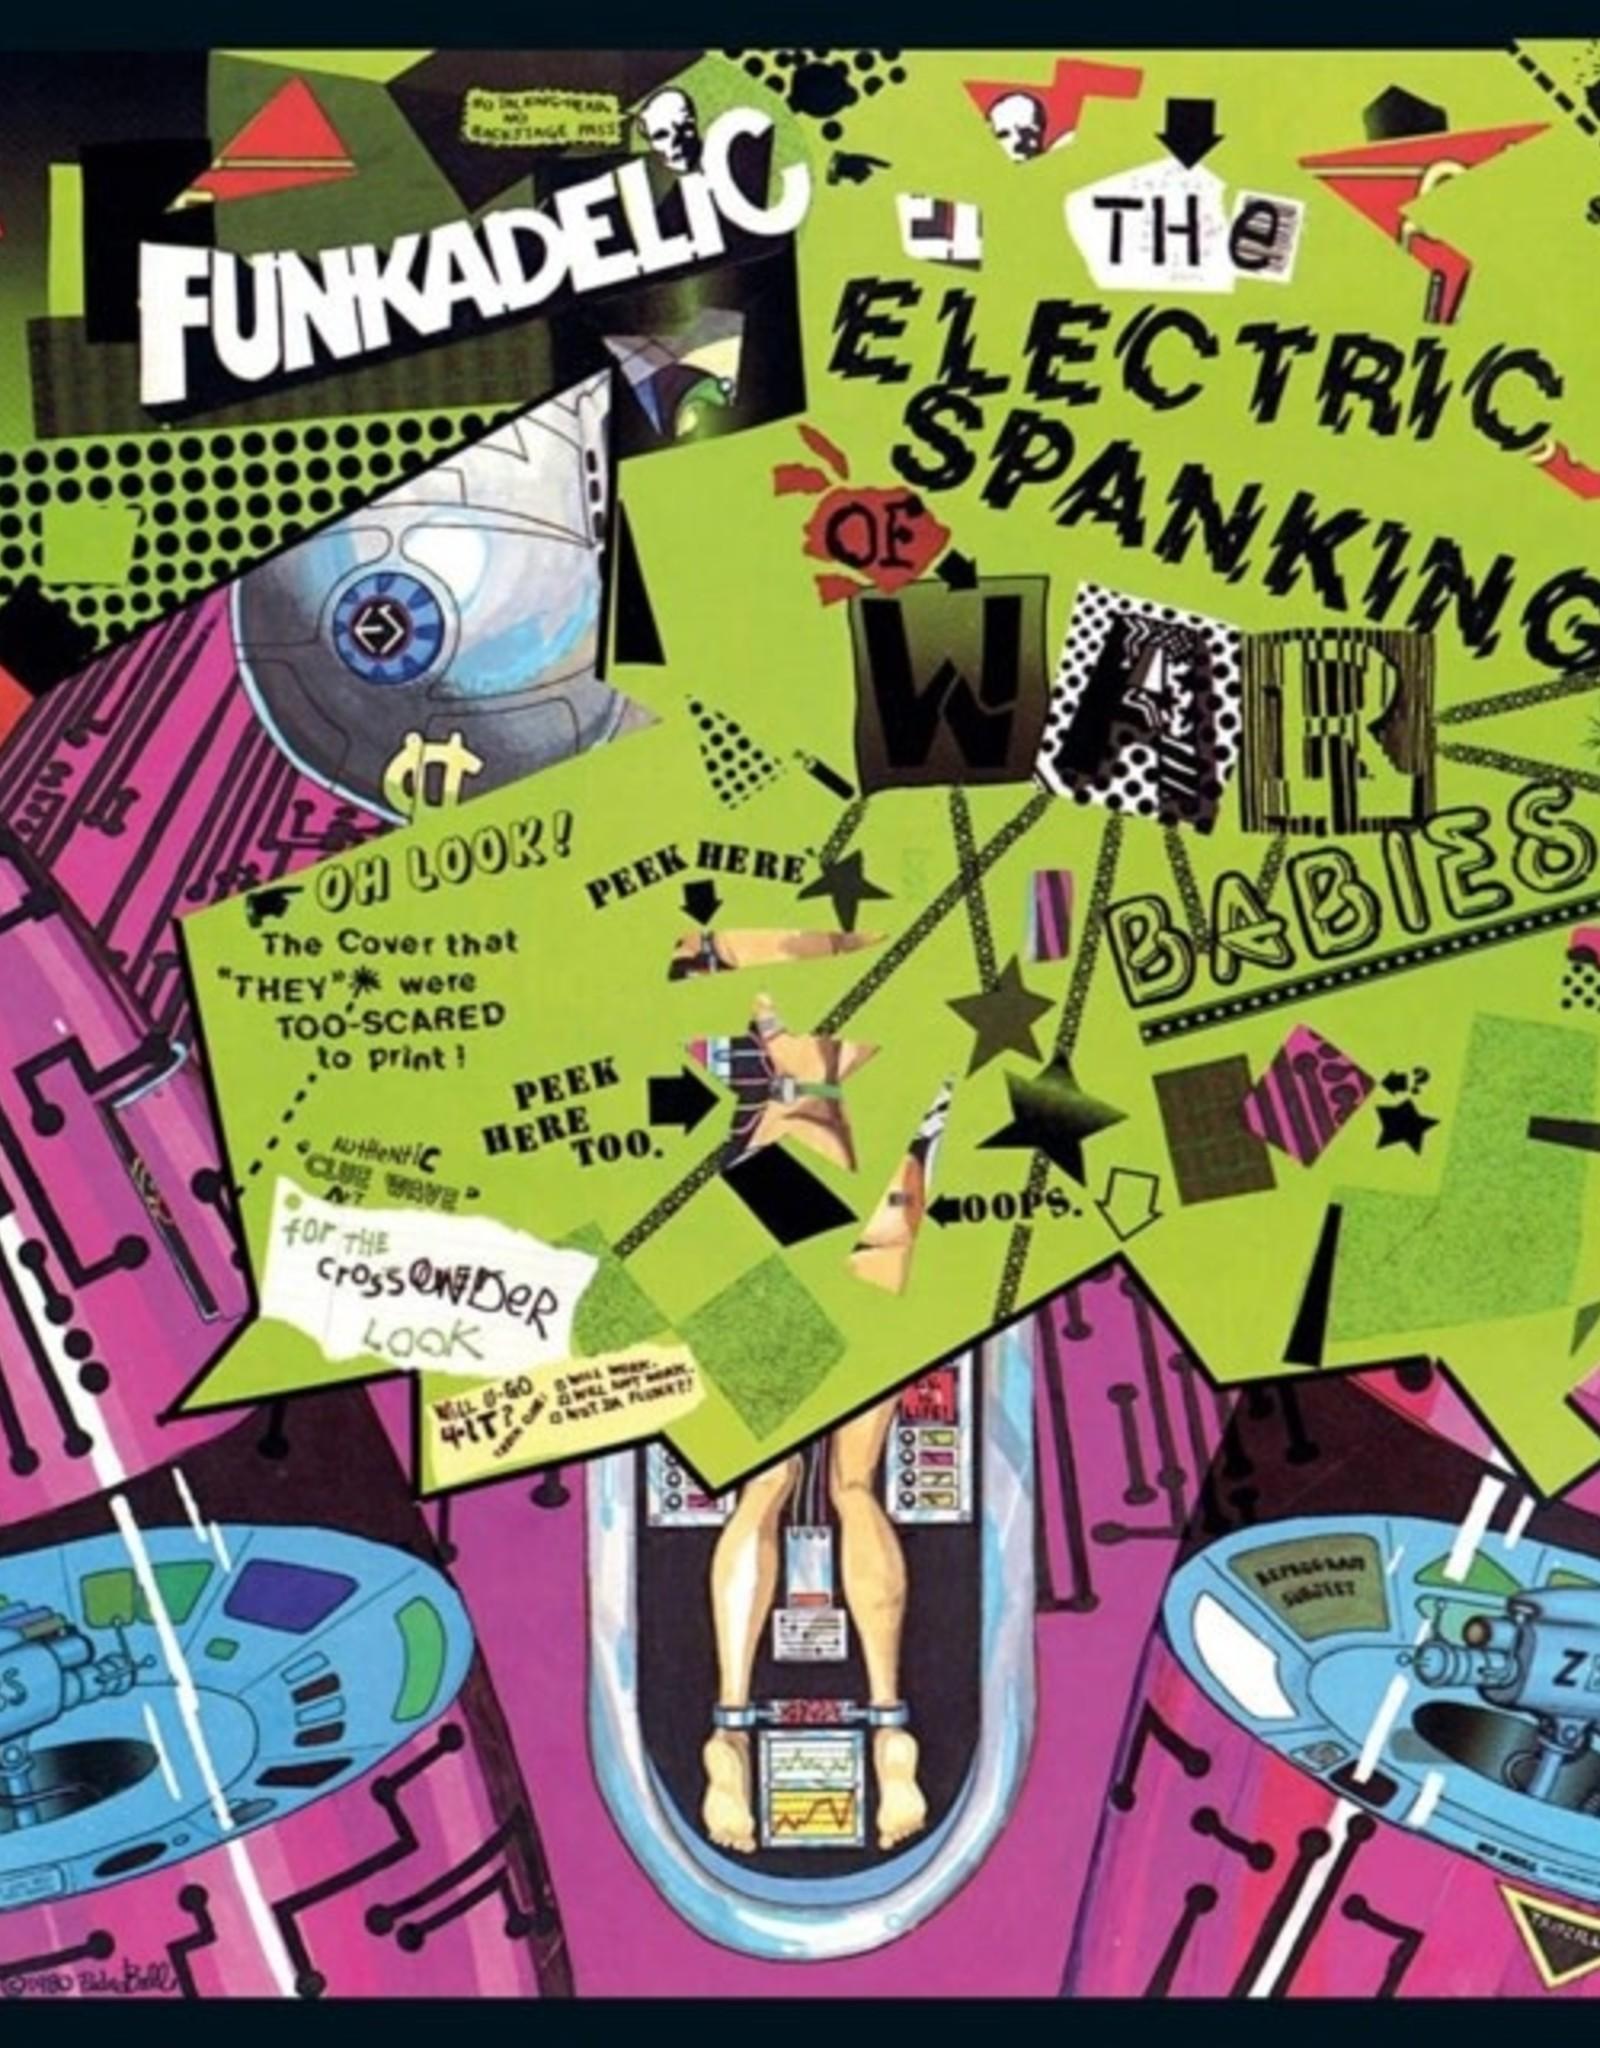 Funkadelic - Electric Spanking of War Babies